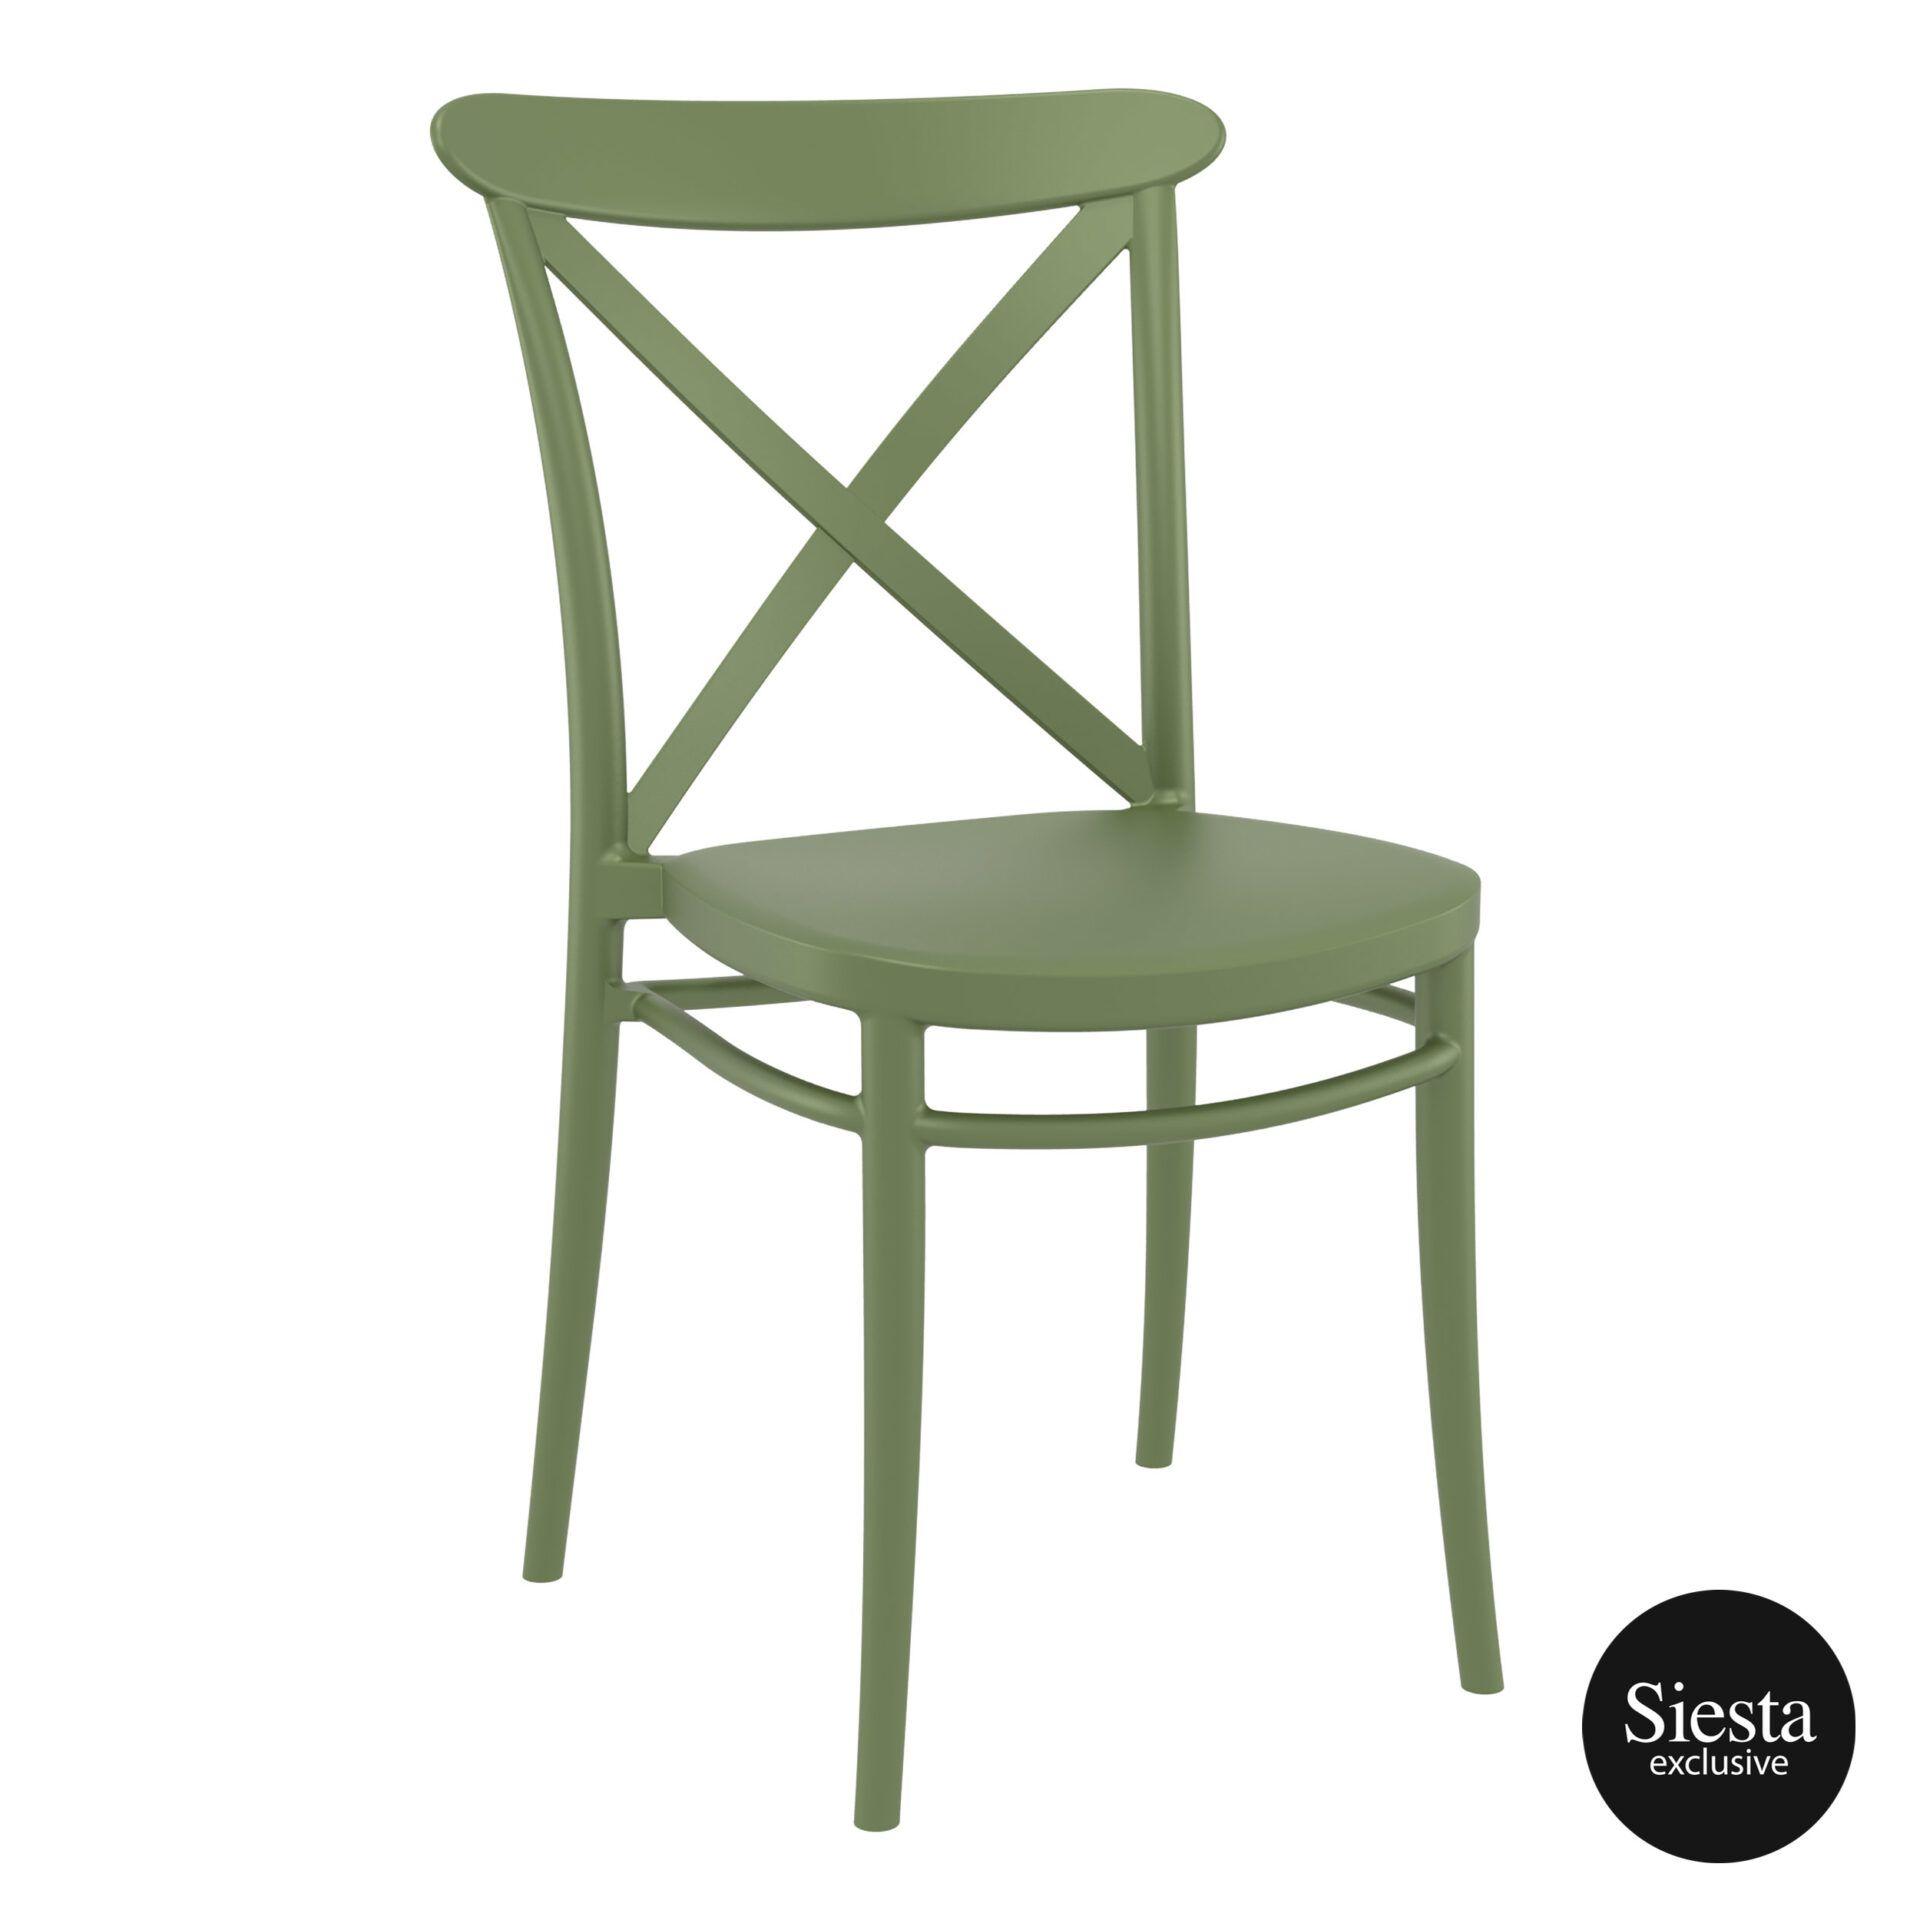 cafe polypropylene cross chair olive green front side 1 1